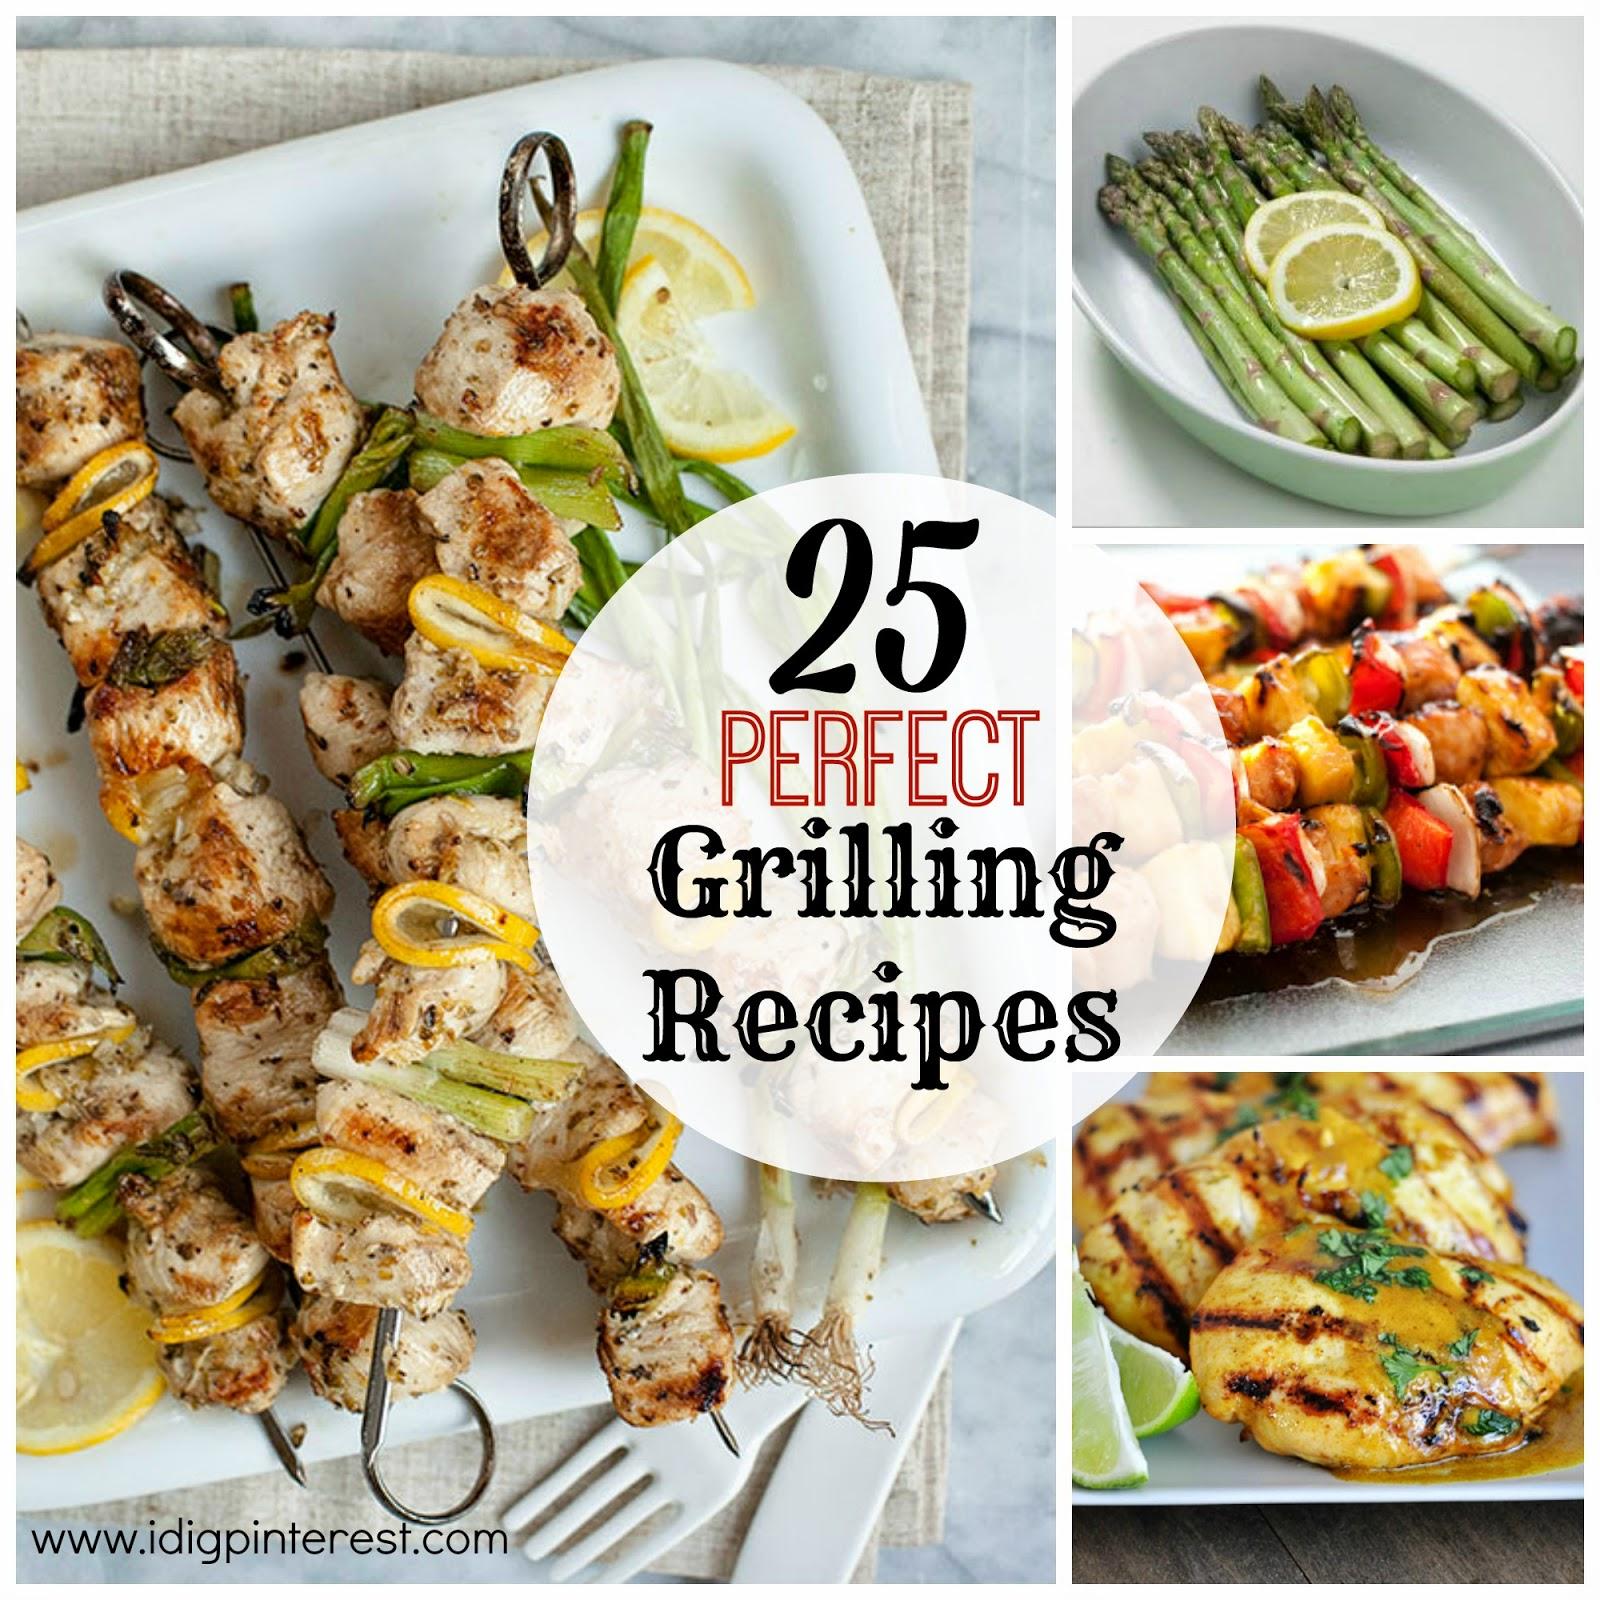 25 Perfect Grilling Recipes